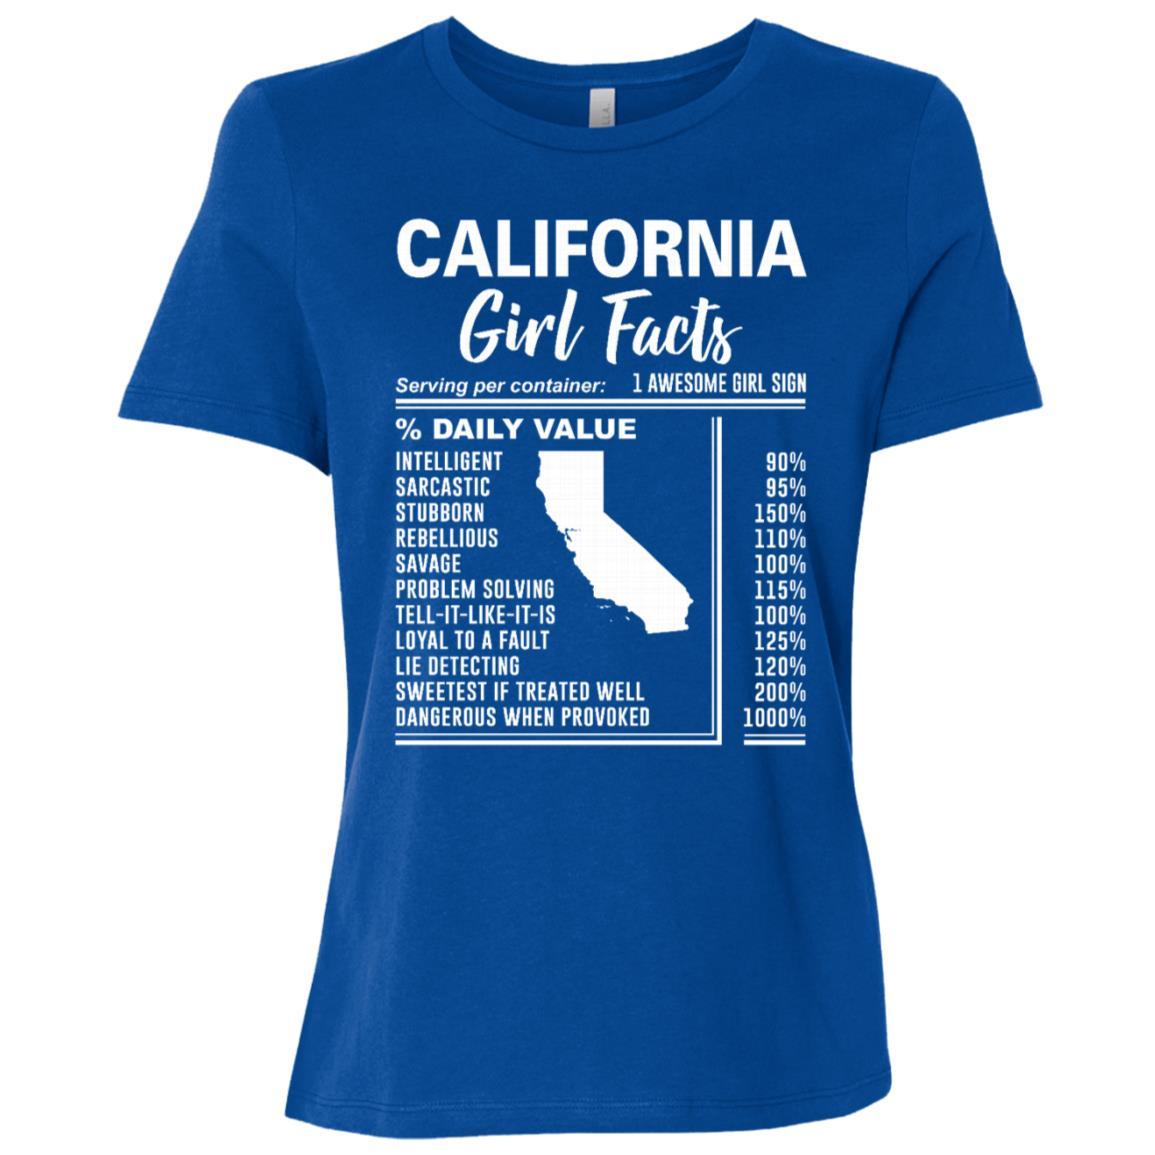 Born in California – California Girl Facts Women Short Sleeve T-Shirt